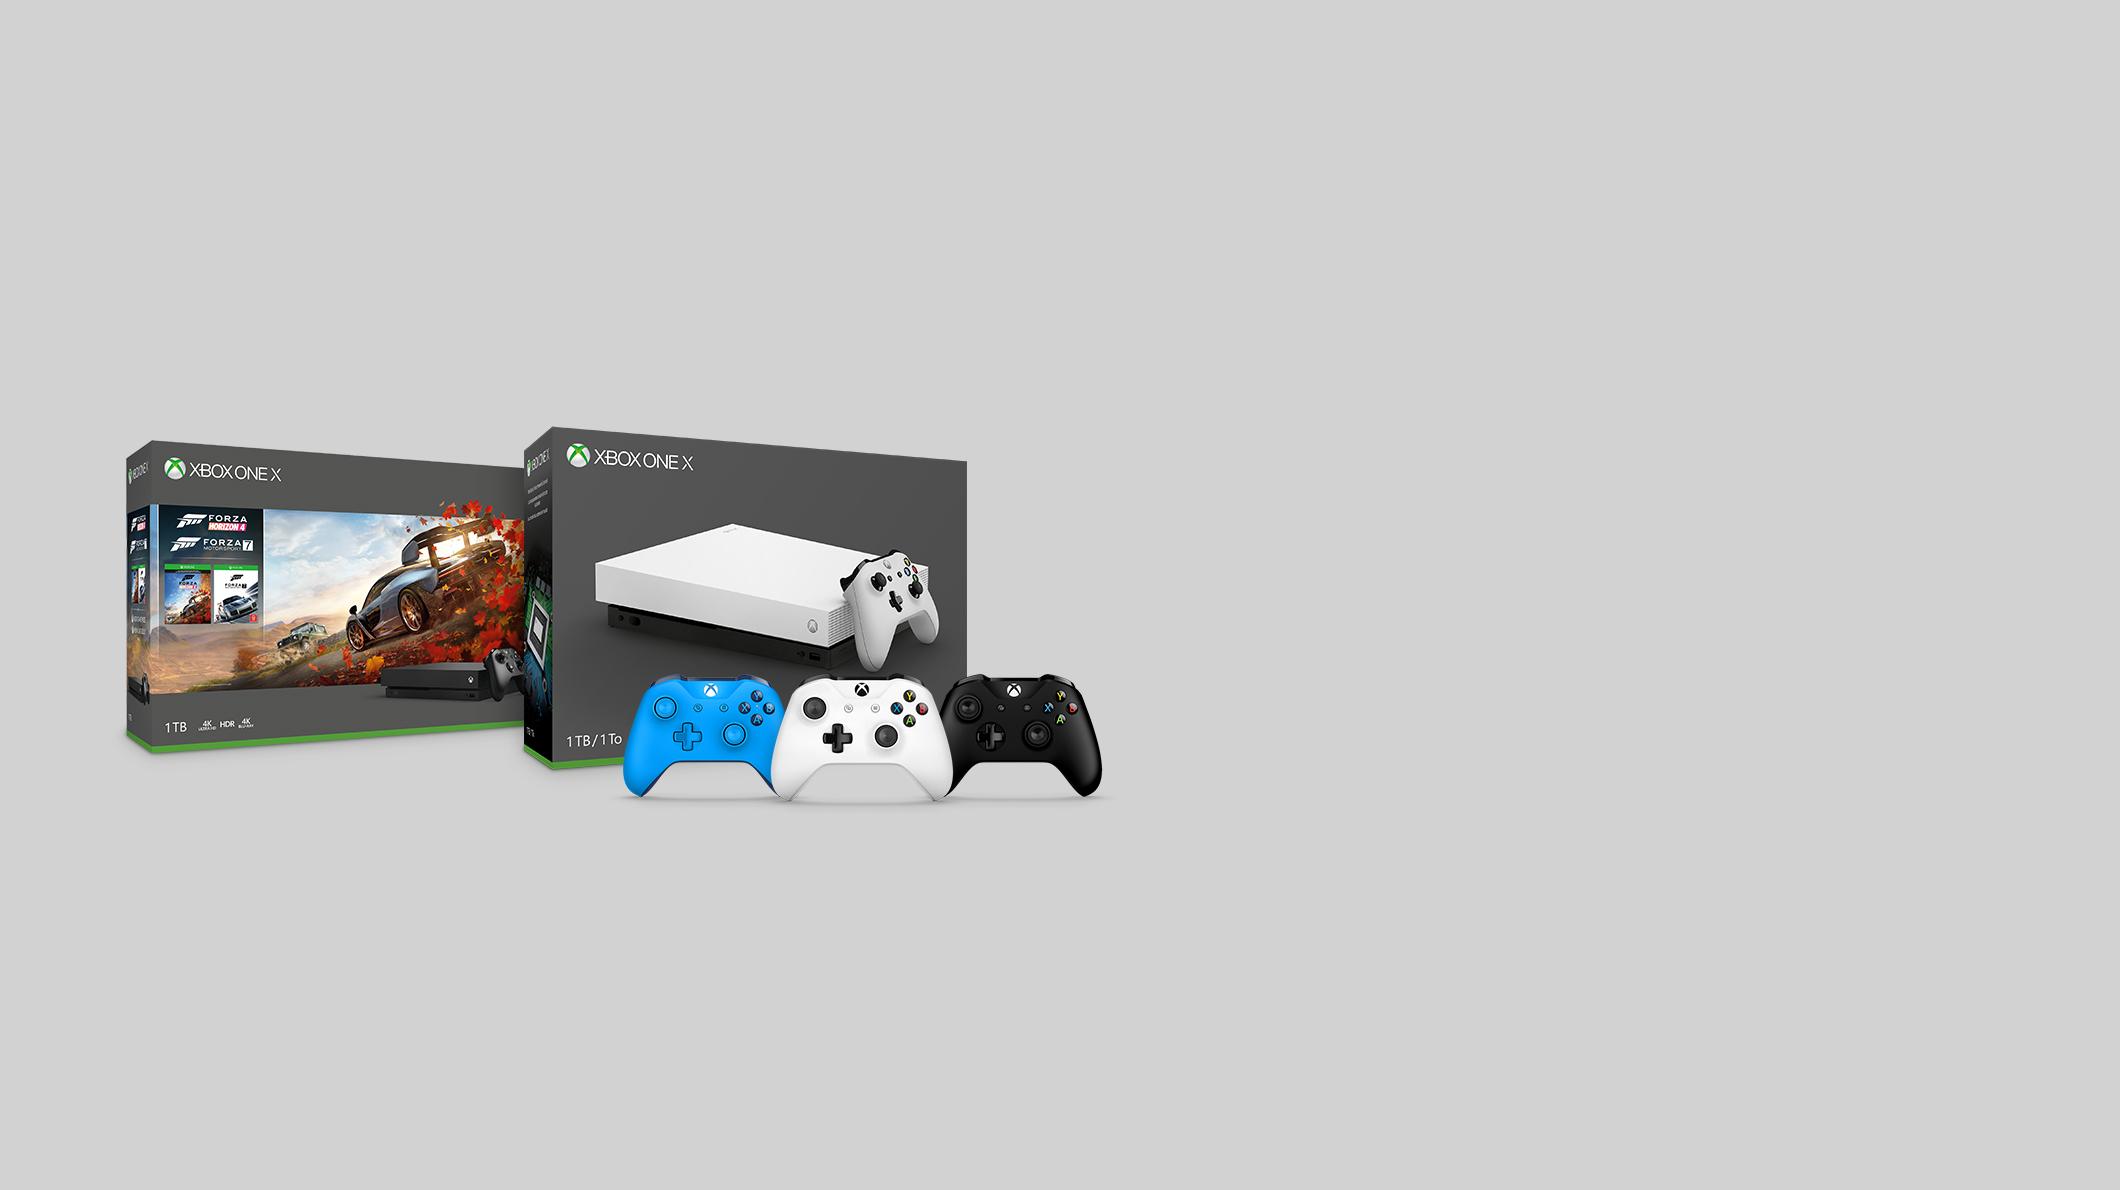 Xbox One X 最大 6,415 円 OFF キャンペーン実施中